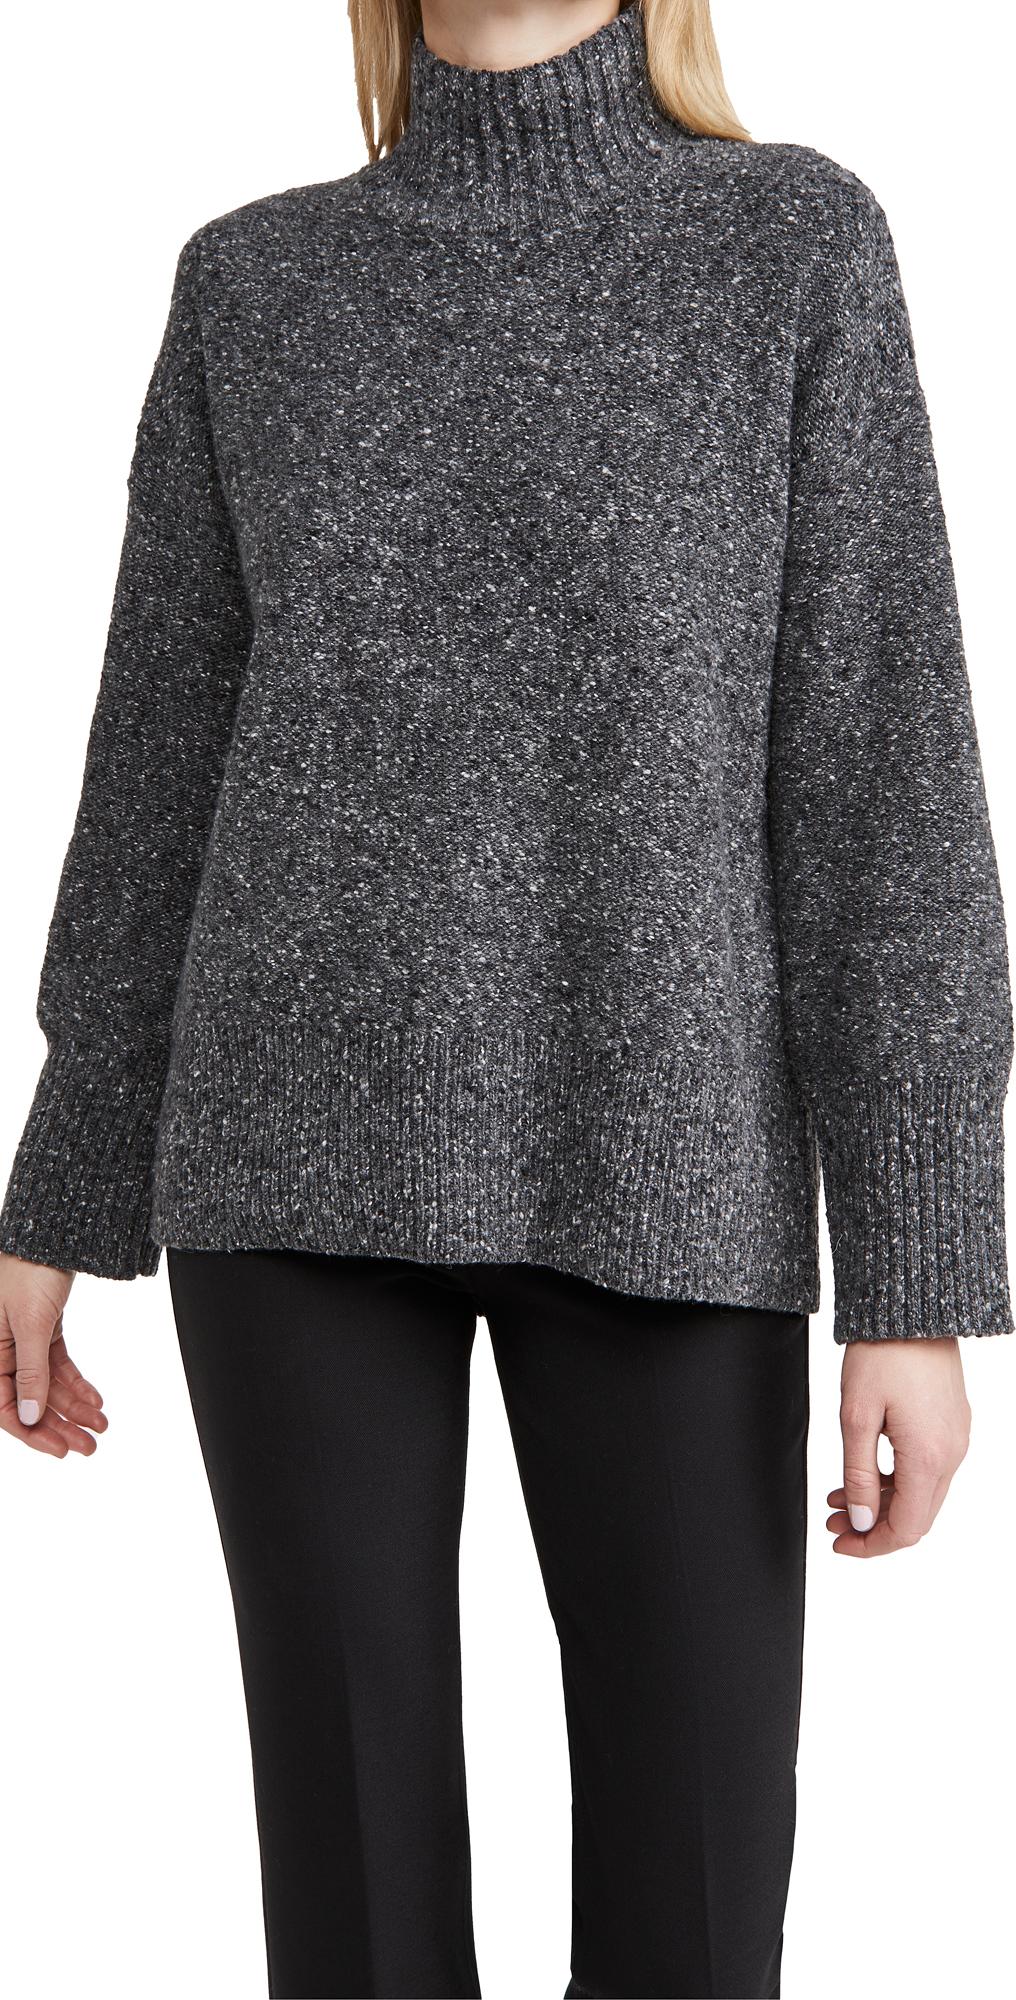 FRAME High Low Turtleneck Sweater